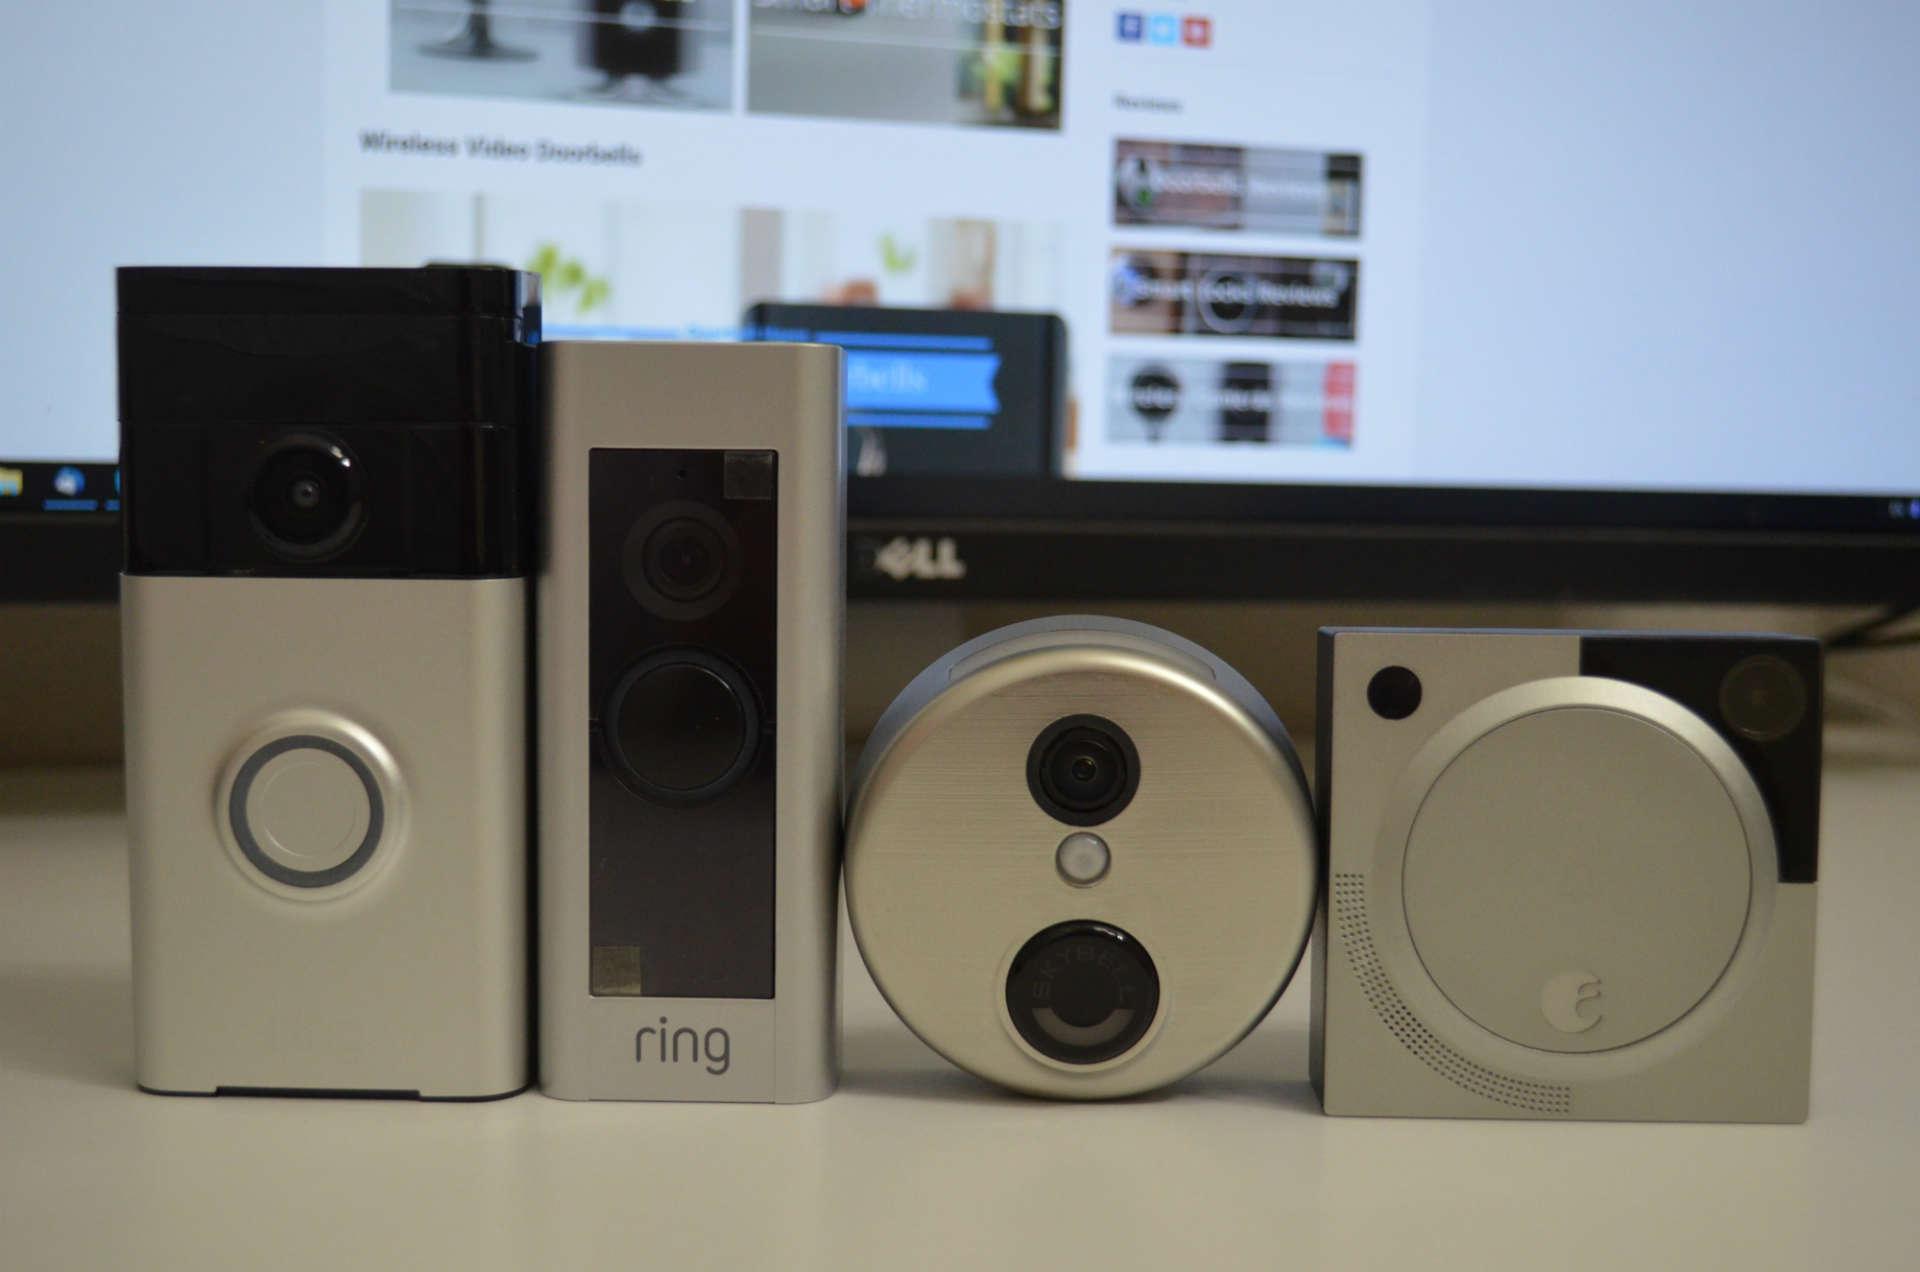 best video doorbell reviews skybell hd vs ring pro vs. Black Bedroom Furniture Sets. Home Design Ideas